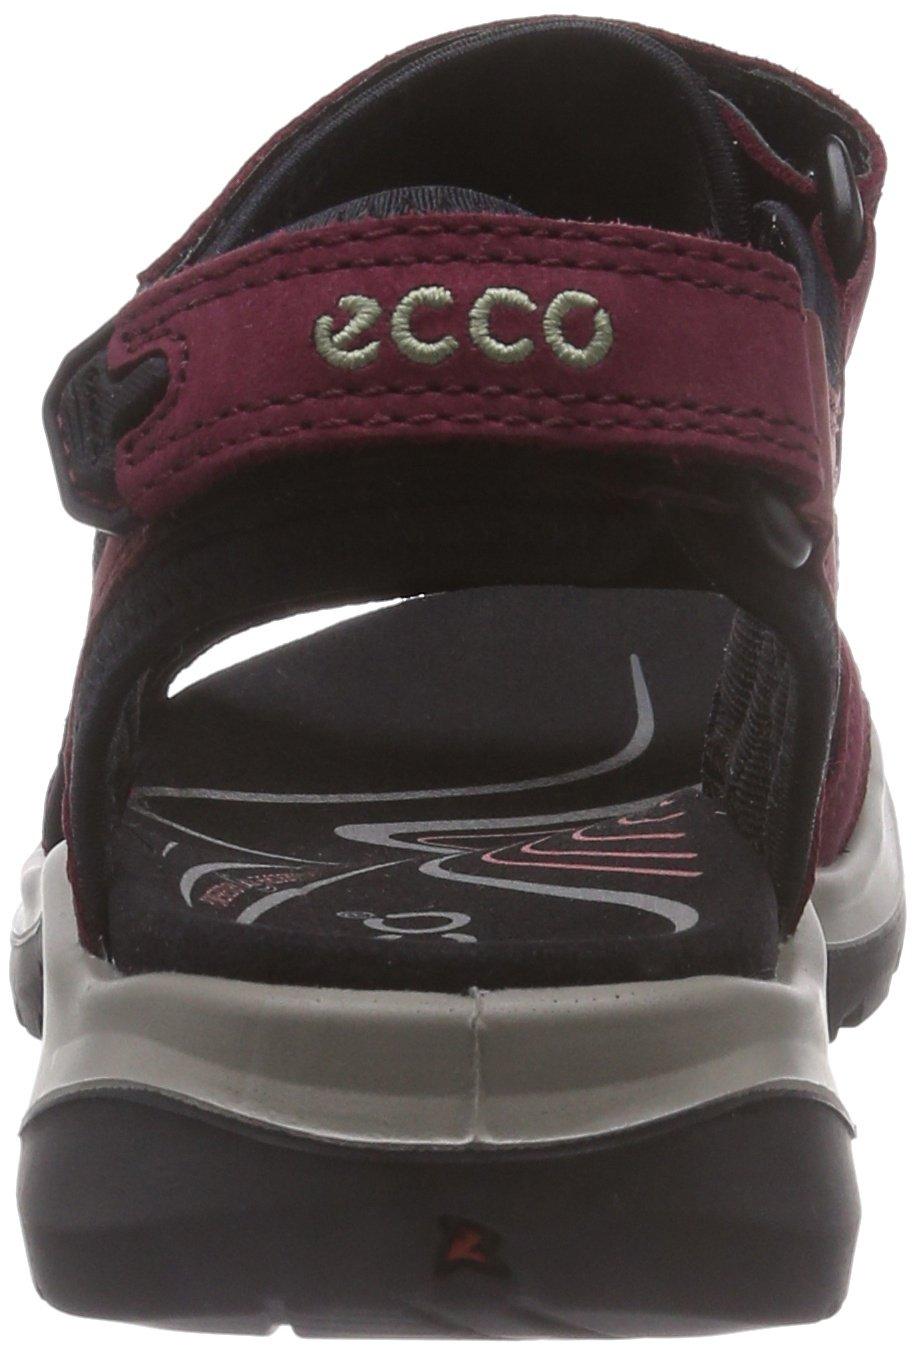 ECCO Women's 39 Yucatan Sandal B00OAUSKBW 39 Women's EU/8-8.5 M US Morillo/Port/Black 5b9b4e